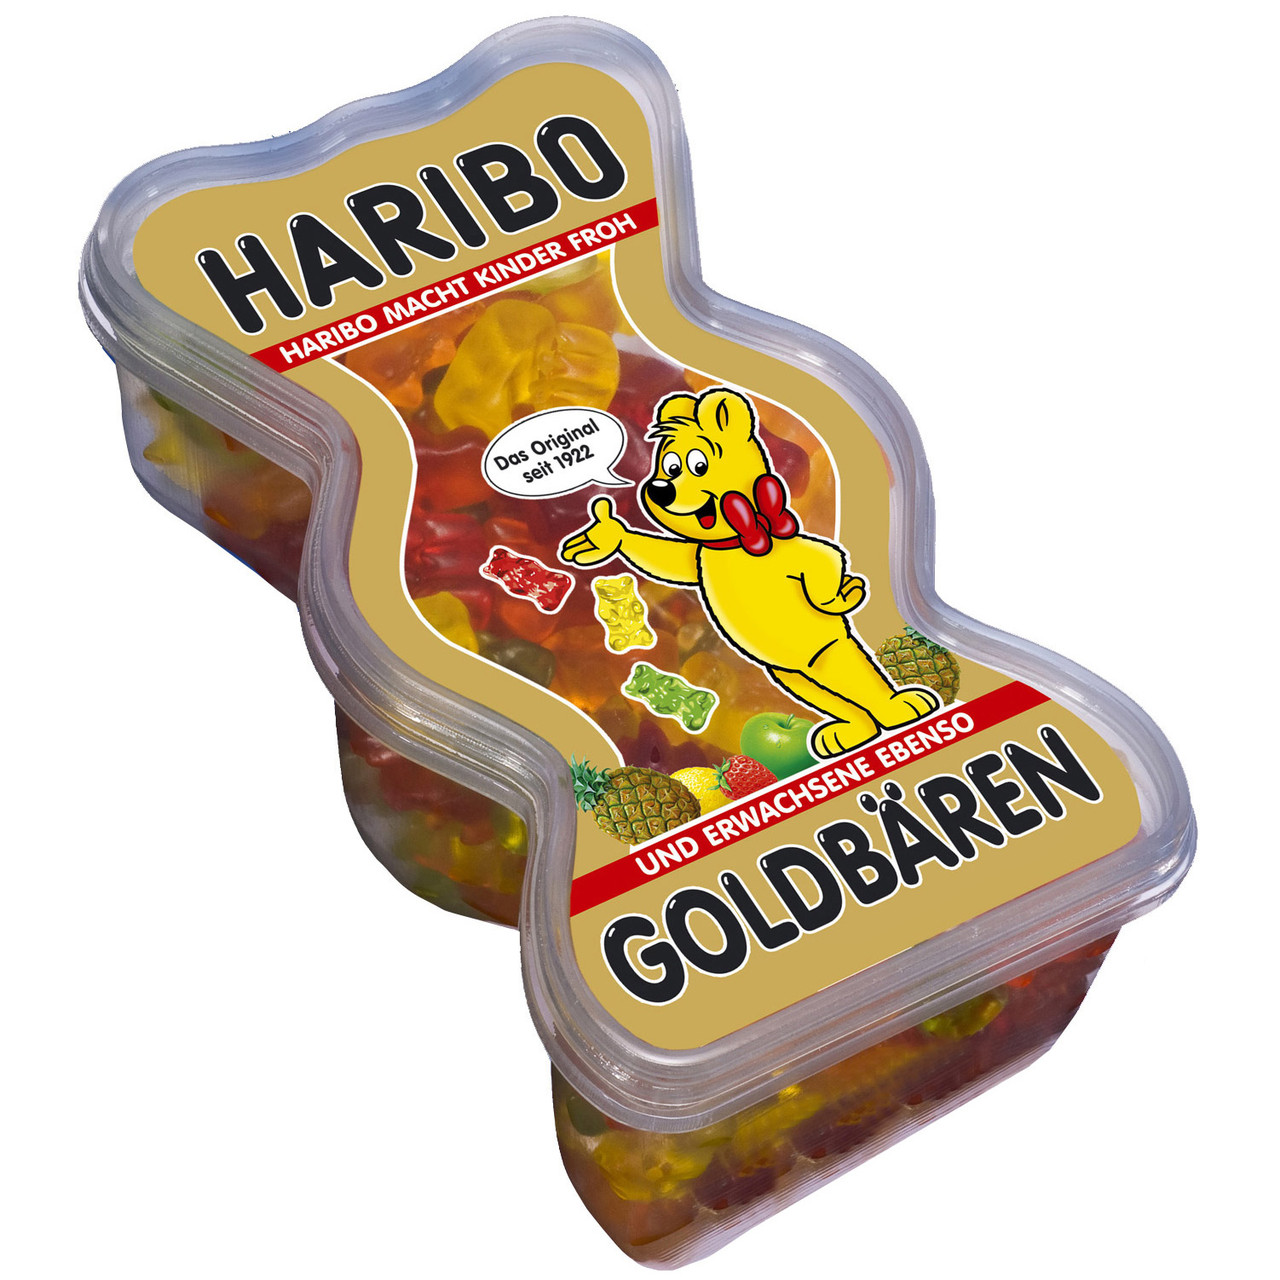 Жевательный мармелад Haribo Goldbaren (желейки харибо), 430 гр.